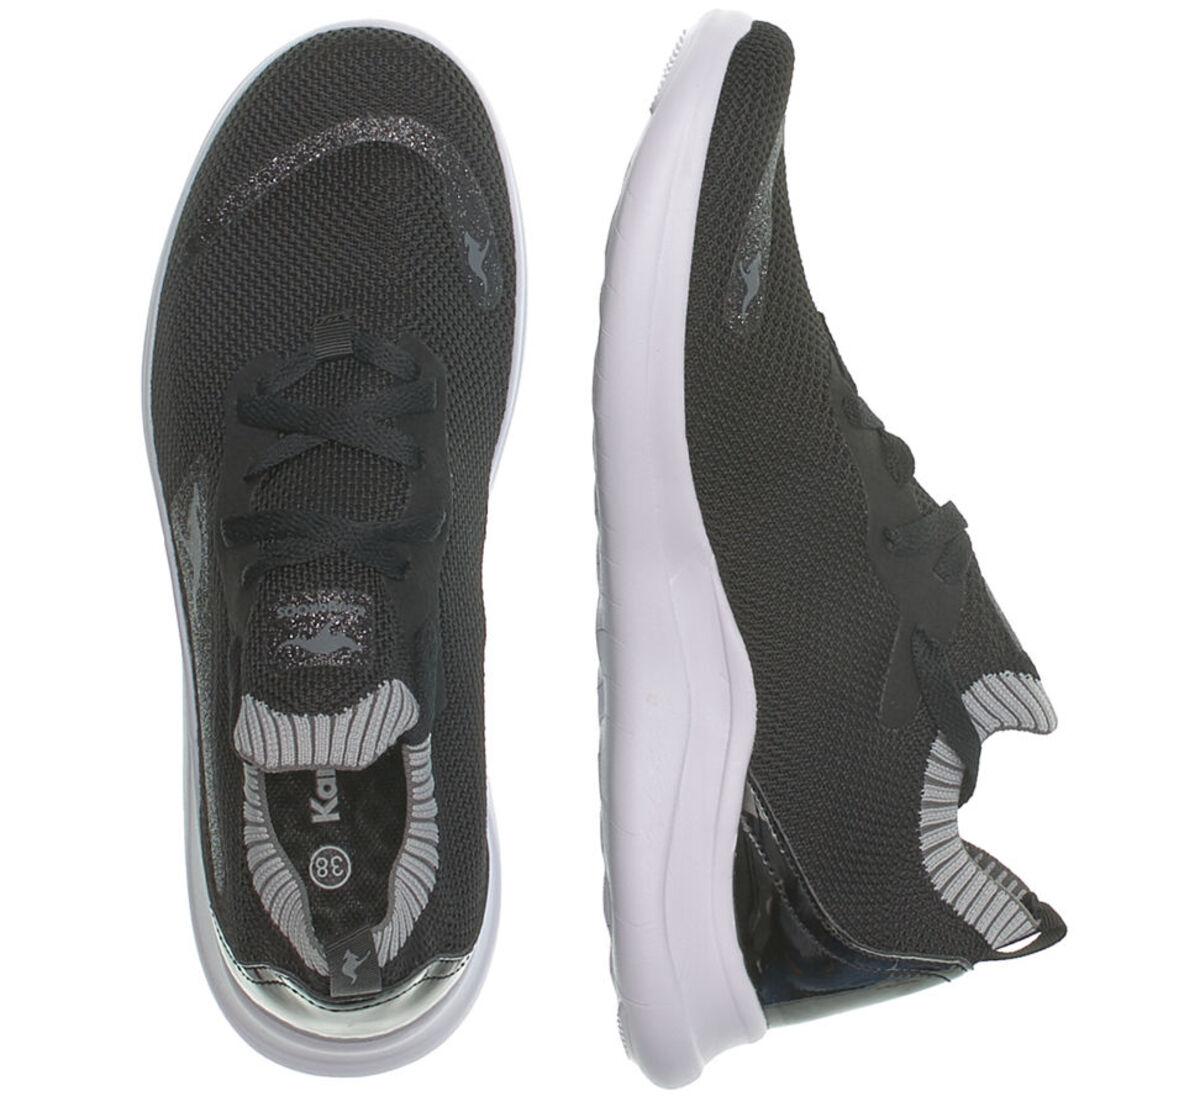 Bild 2 von Kangaroos Sneaker - KG-LIMBER SII